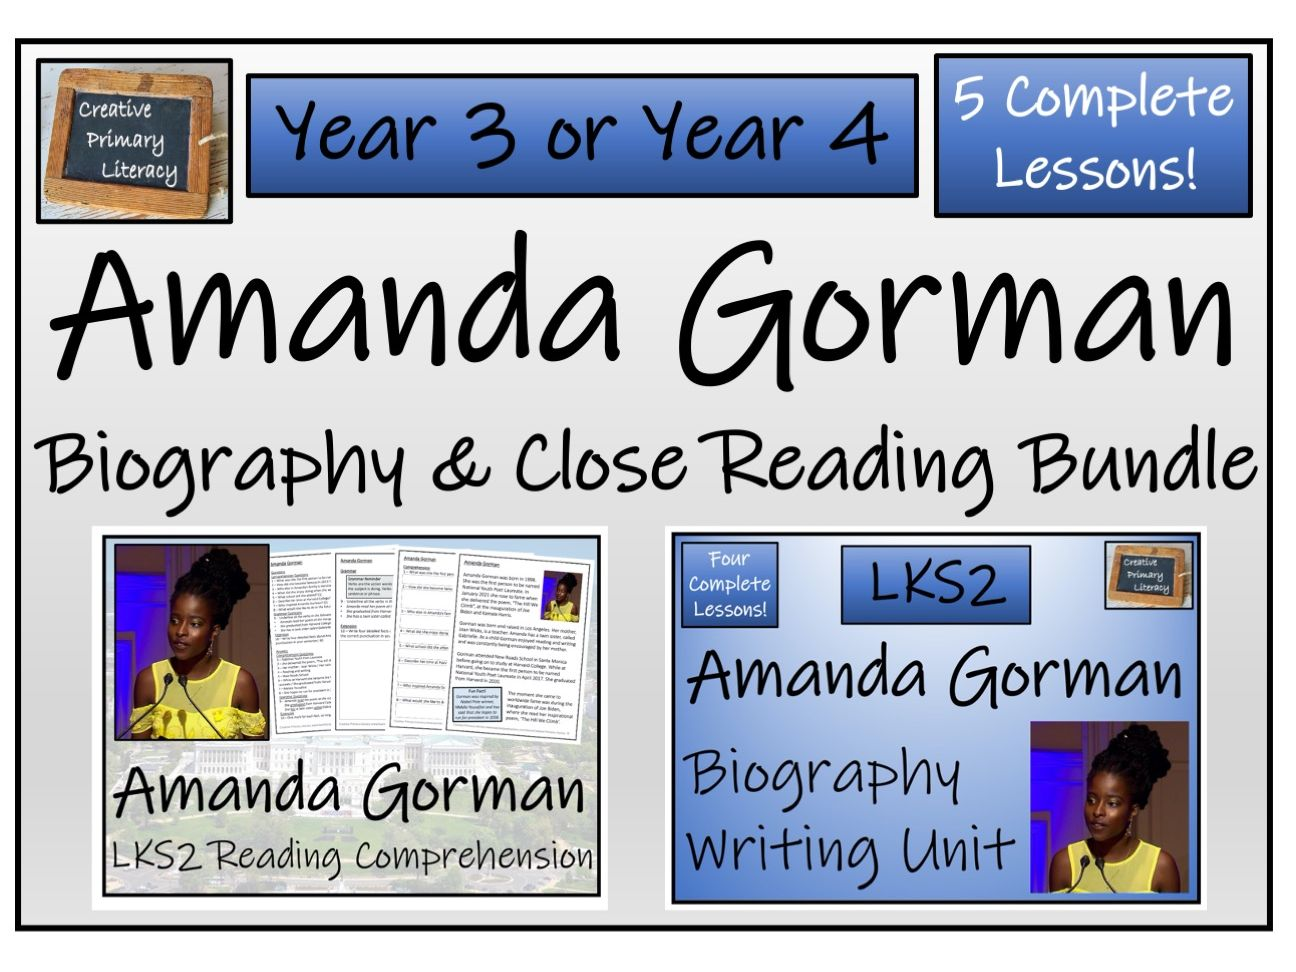 LKS2 - Amanda Gorman Reading Comprehension & Biography Bundle